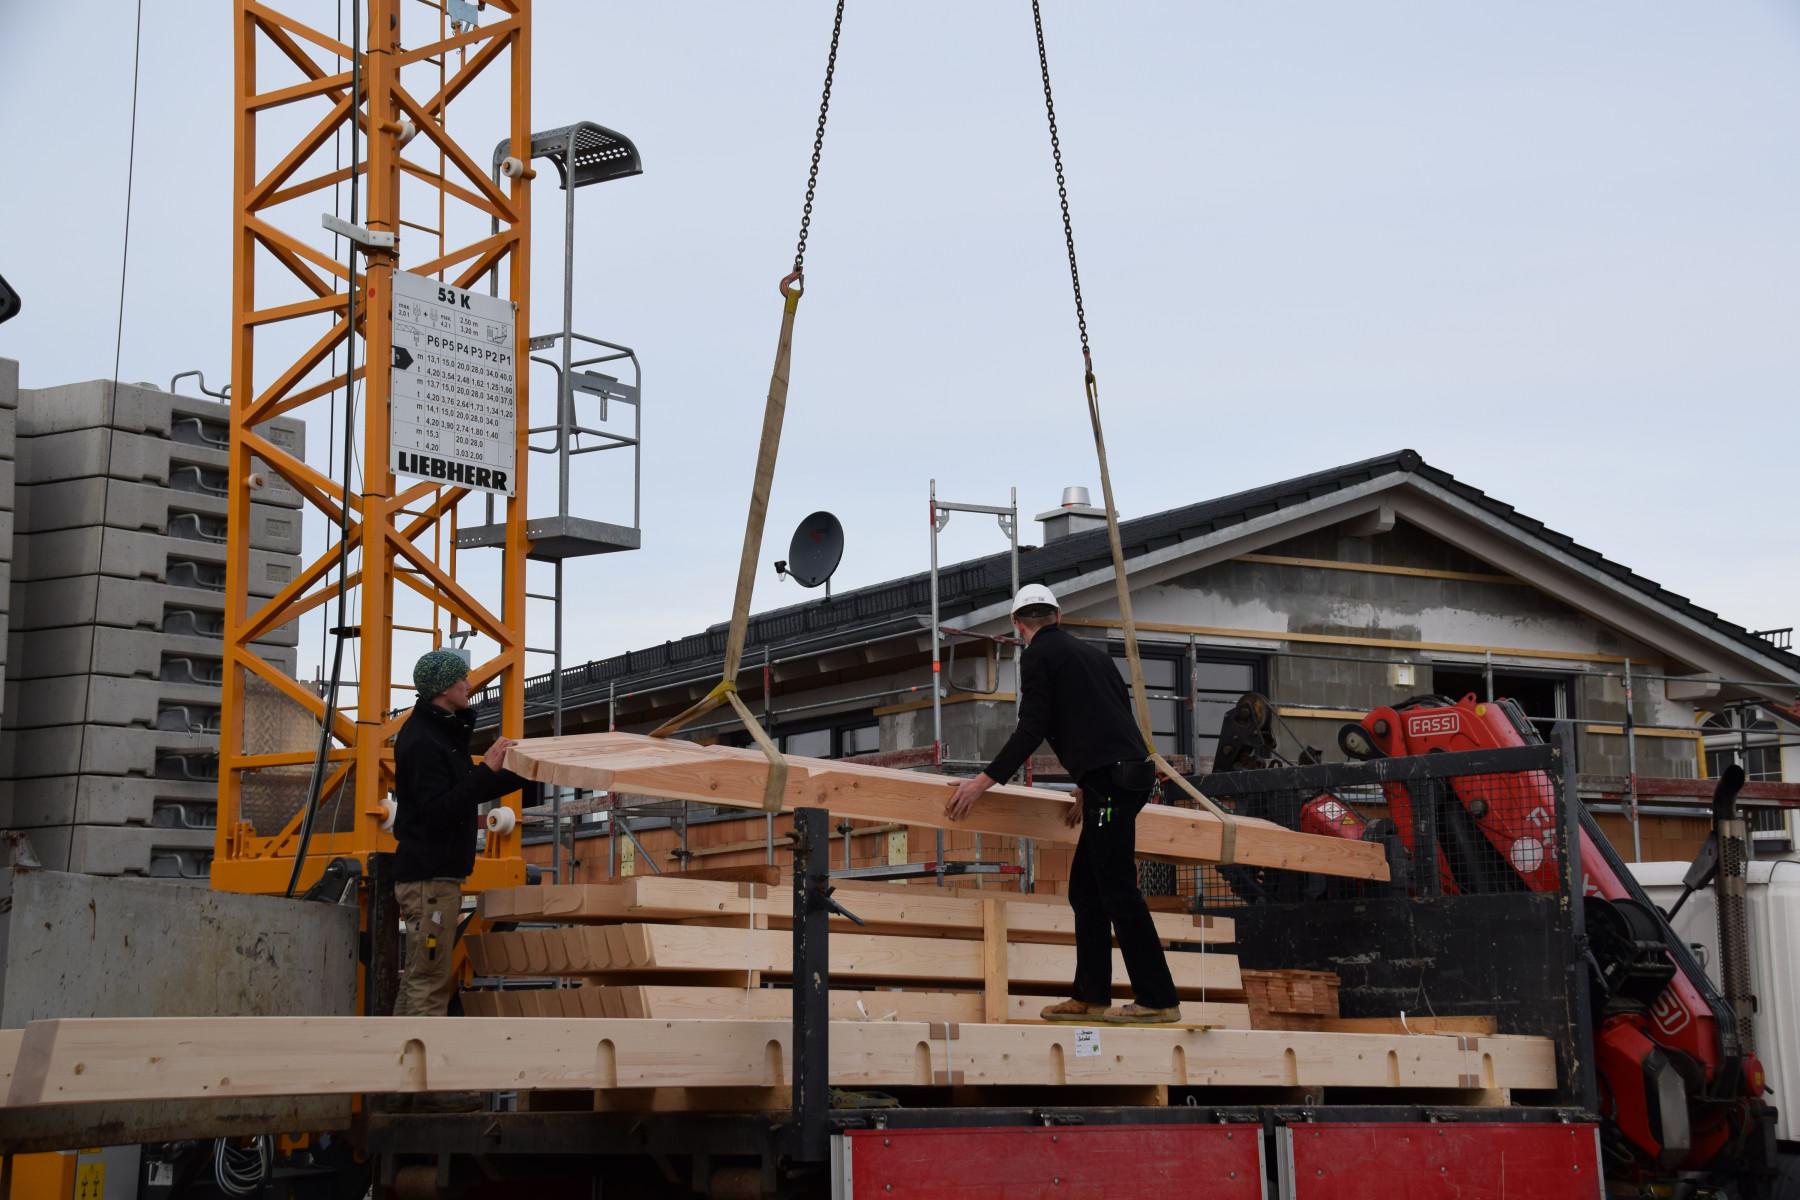 DSC_0710Strasser Holzbau Riedering.jpg